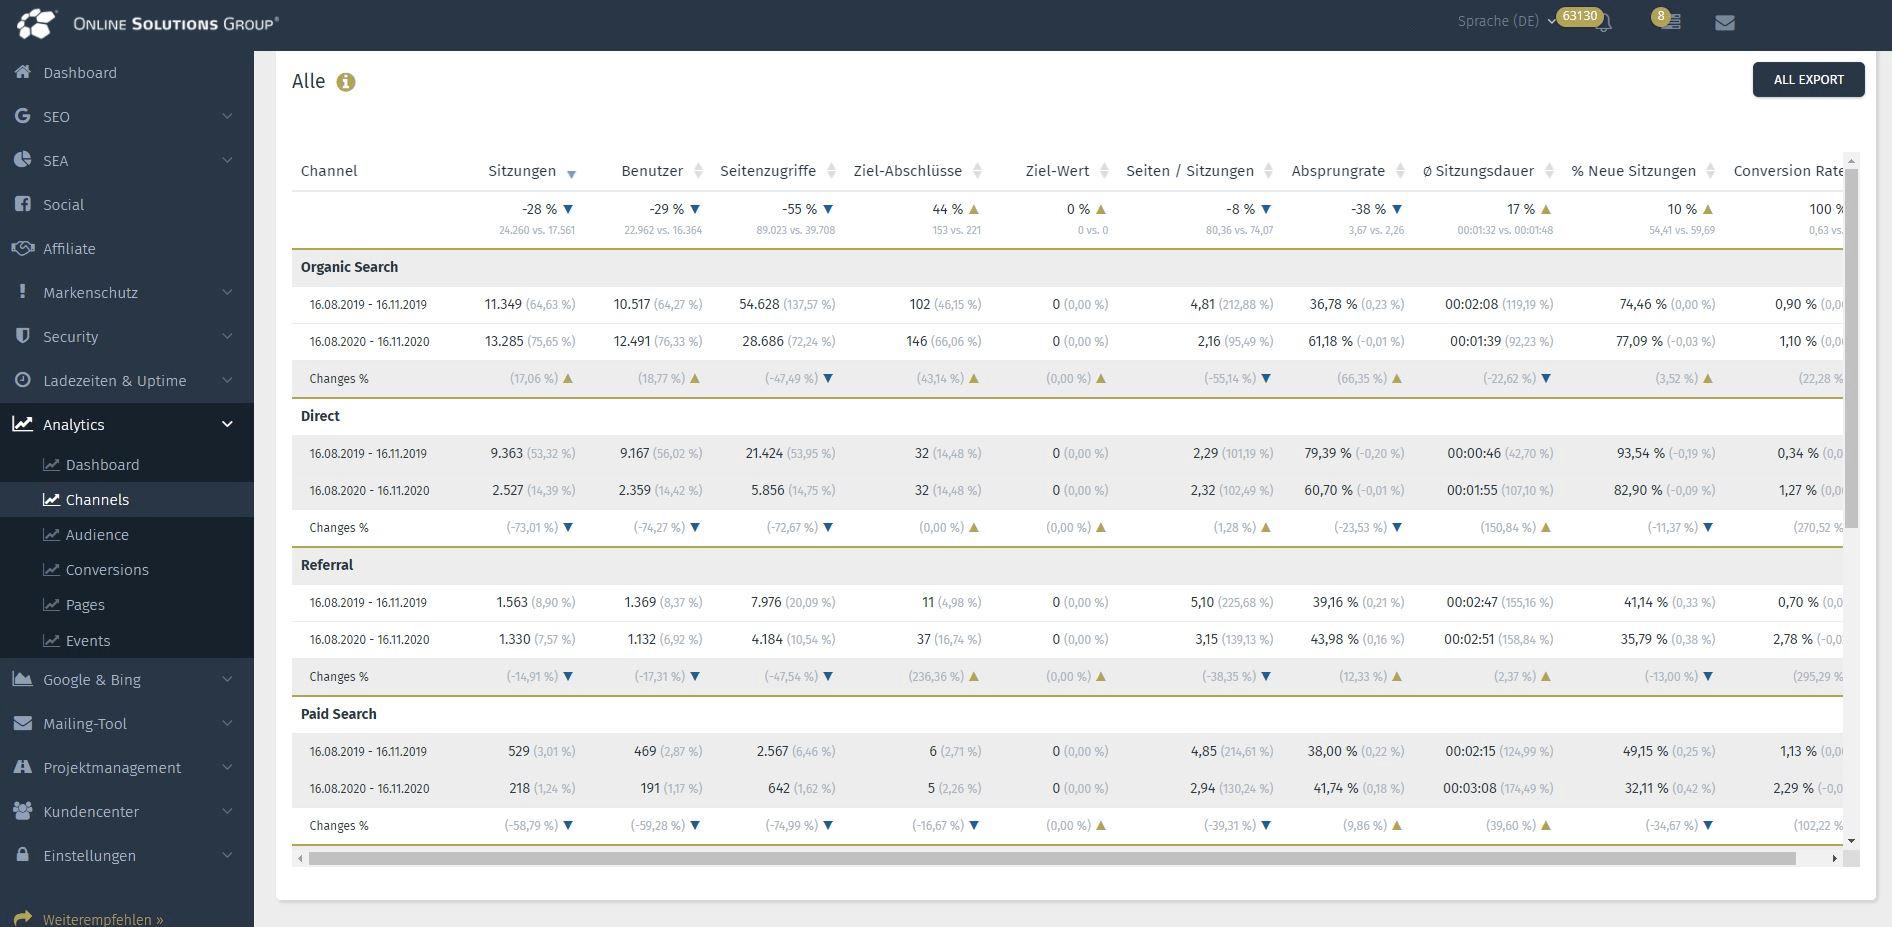 Google Analytics Tool in der Performance Suite Channels